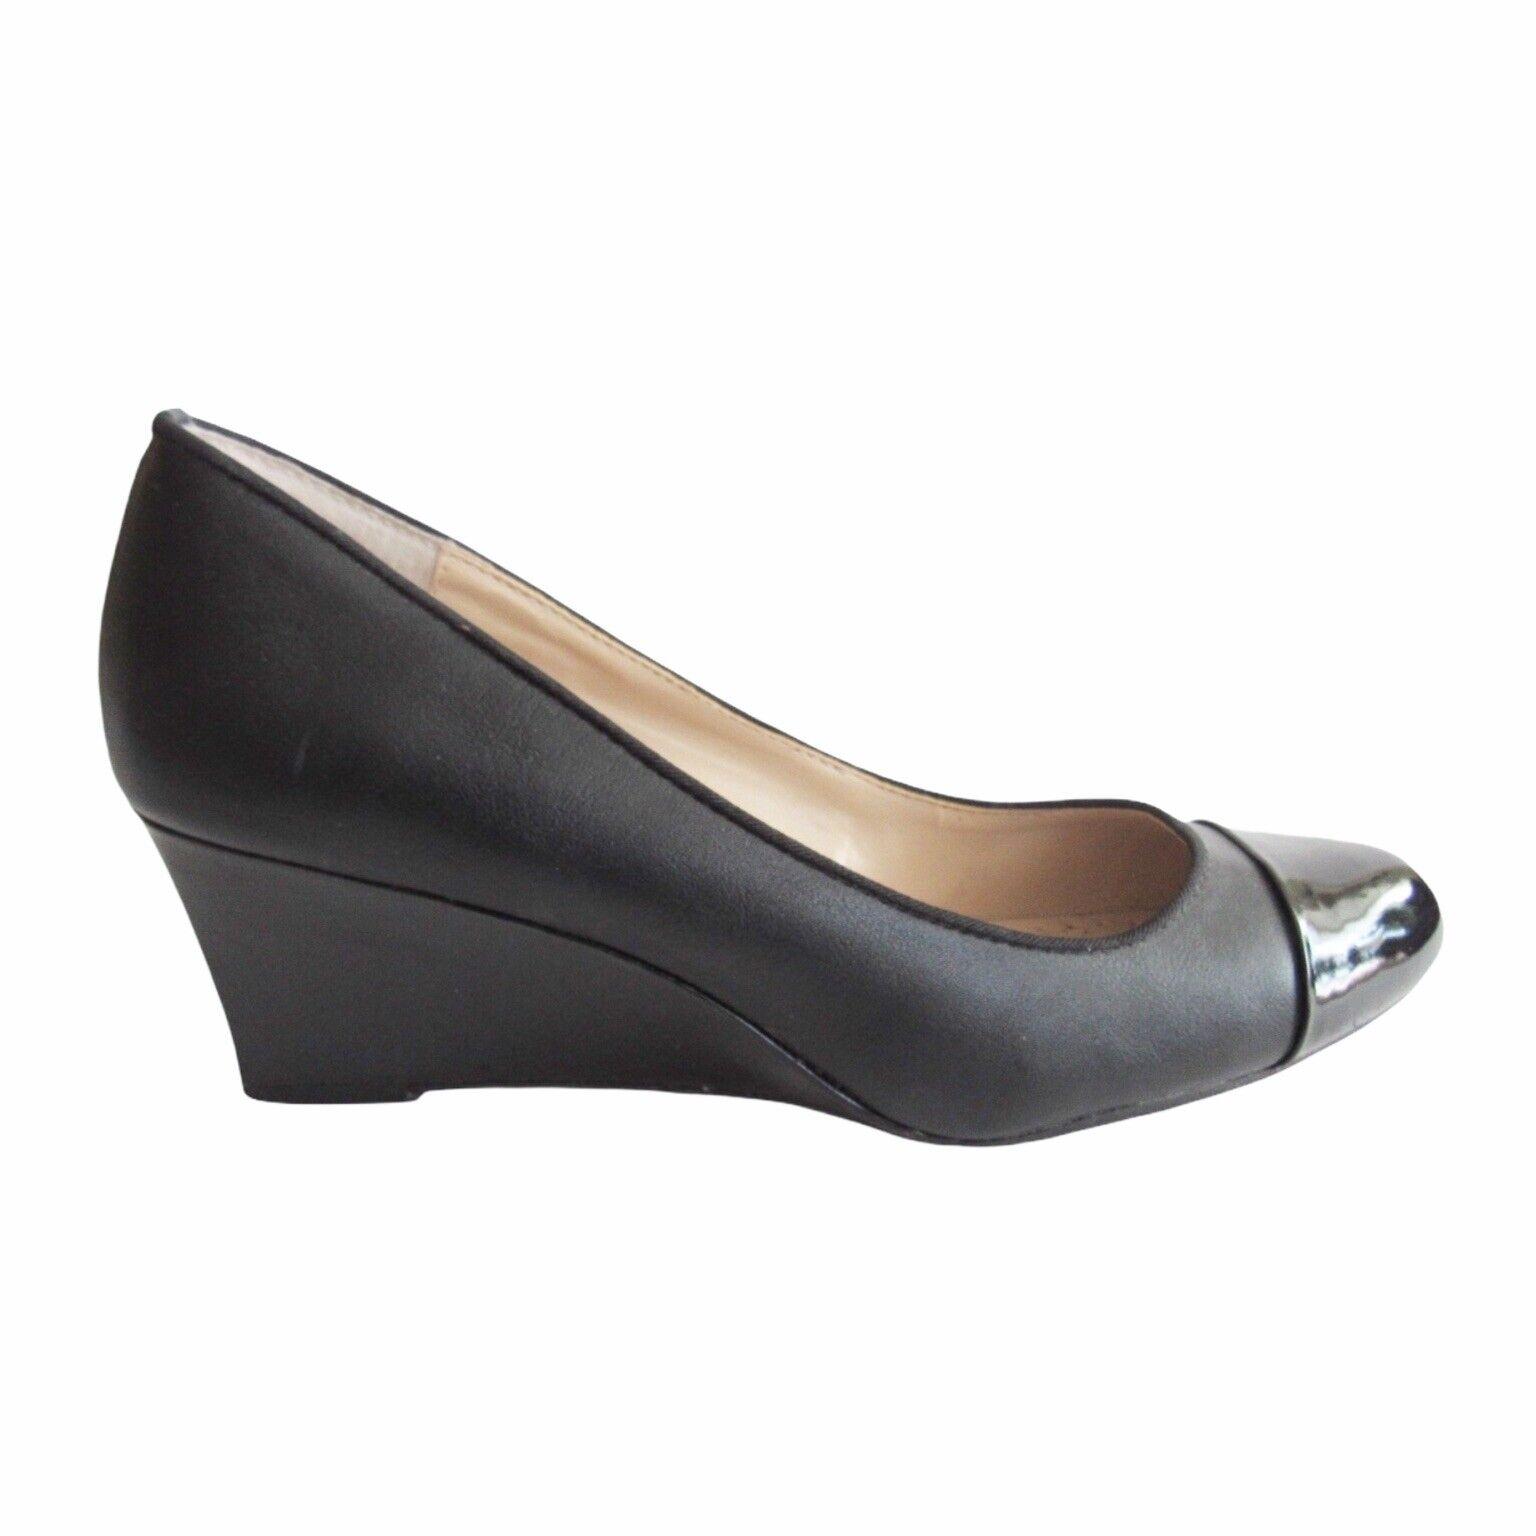 Adrienne Vittadini Wedge Heels 8 Black Patent Cap Toe Faux Leather Career Office